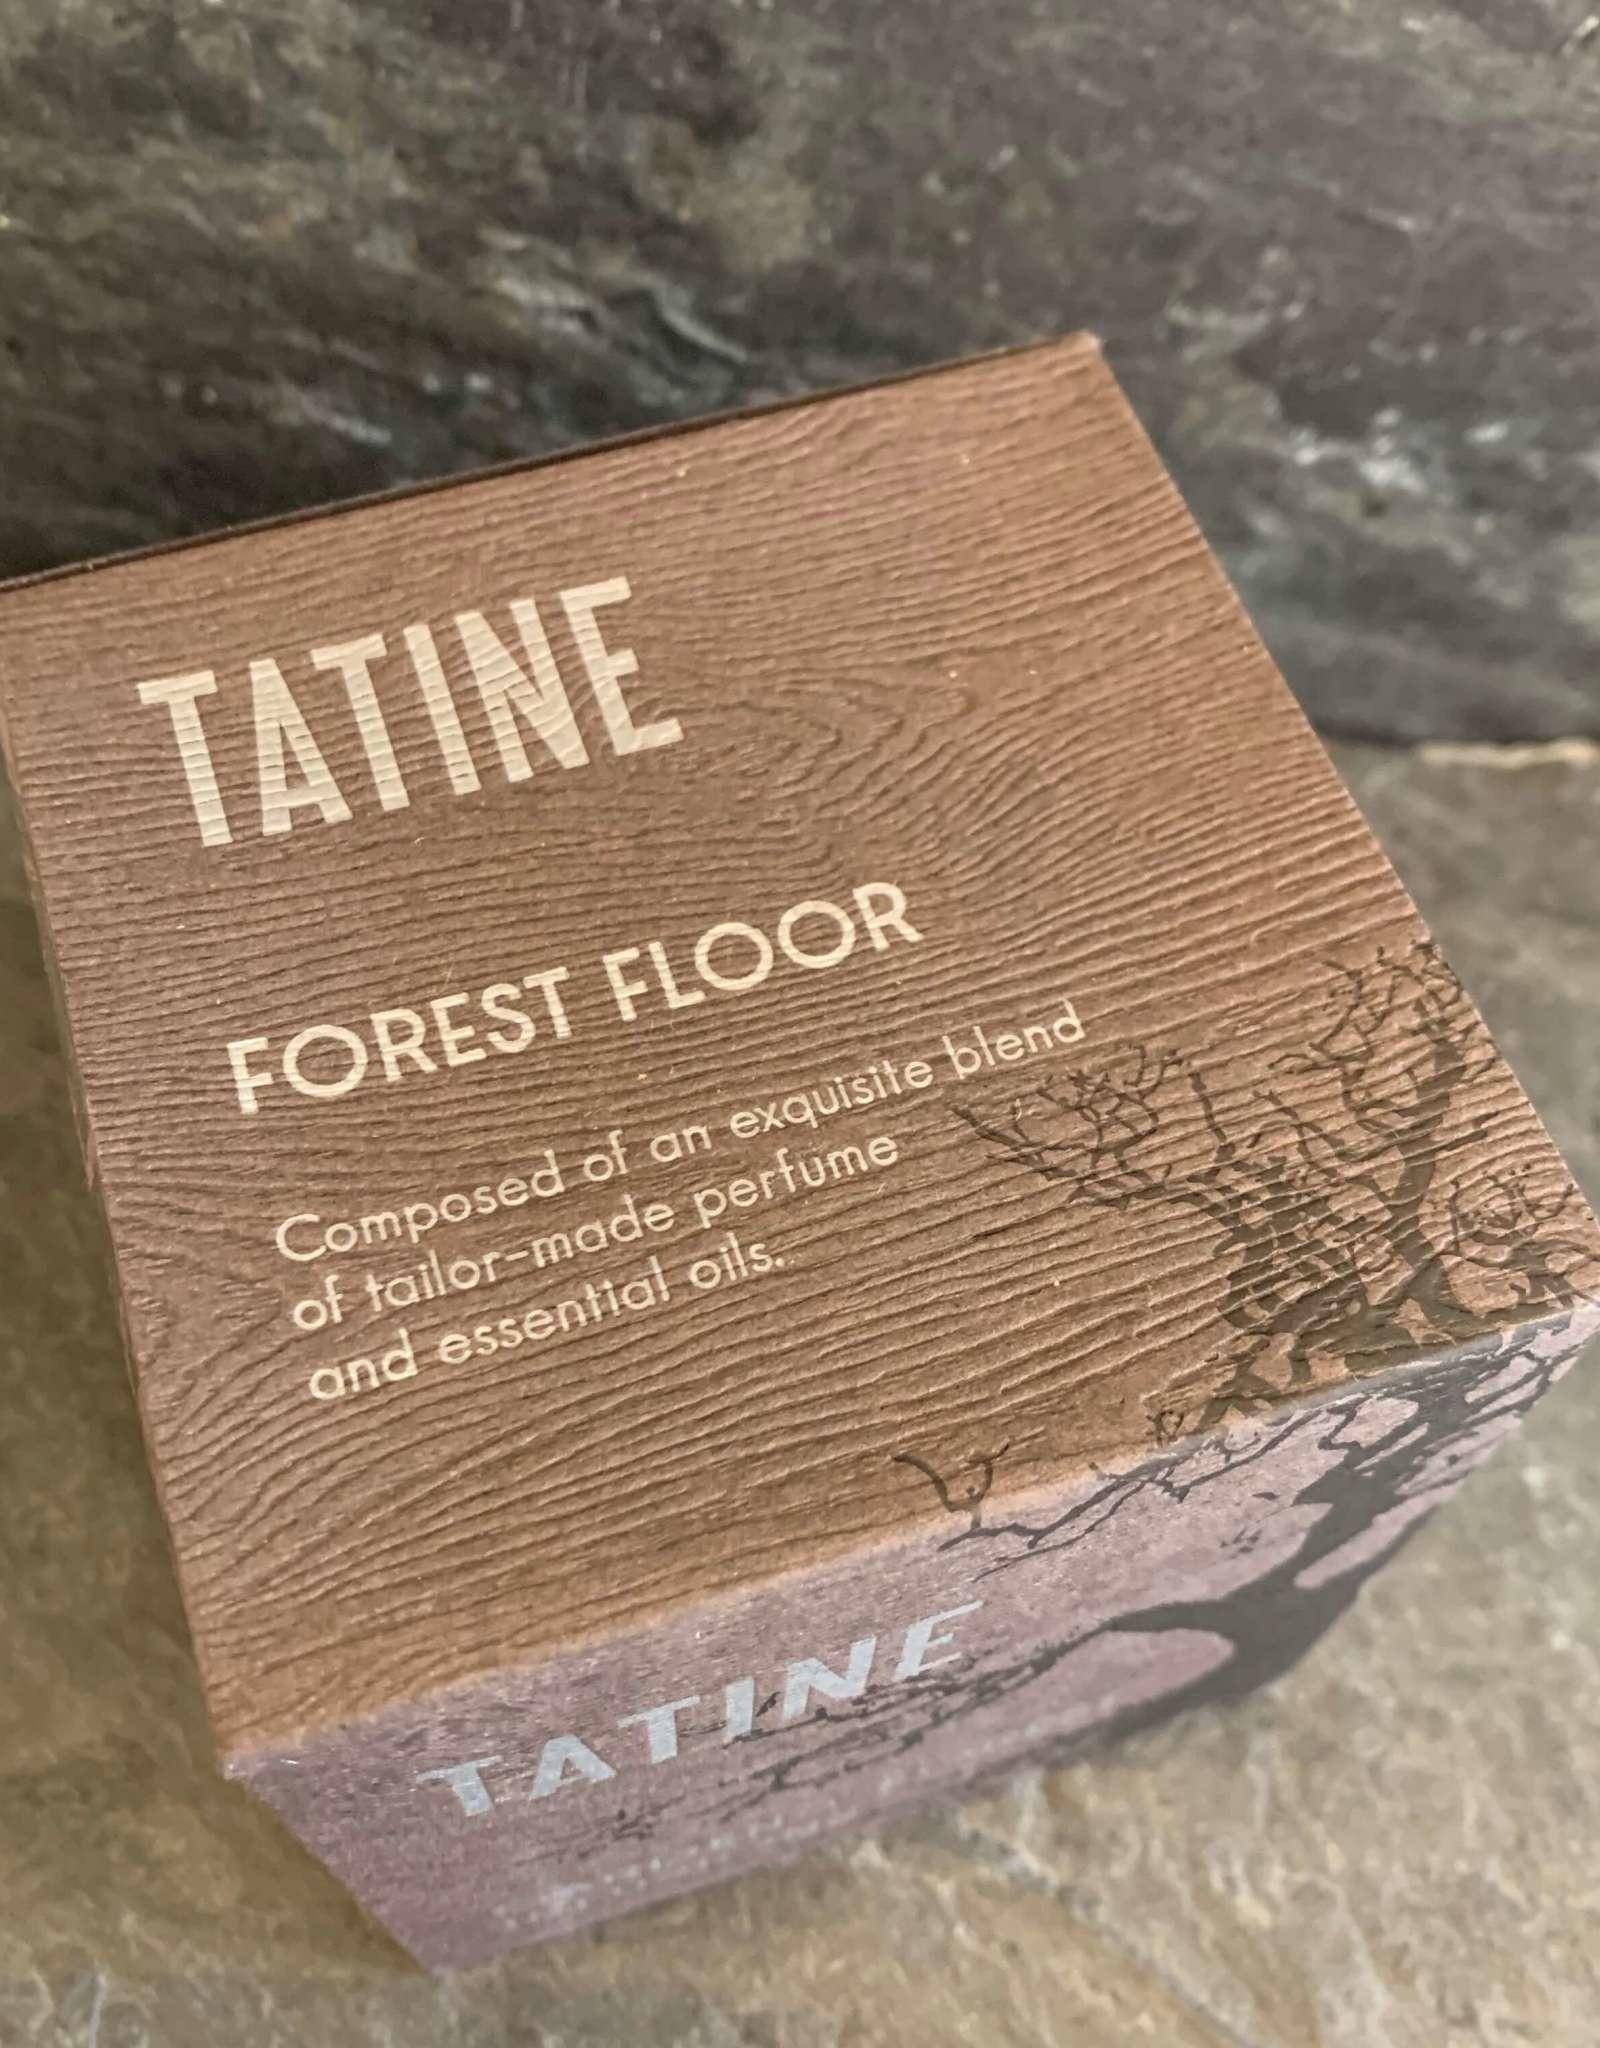 Tatine Tatine Garden+Forest Forest Floor Candle